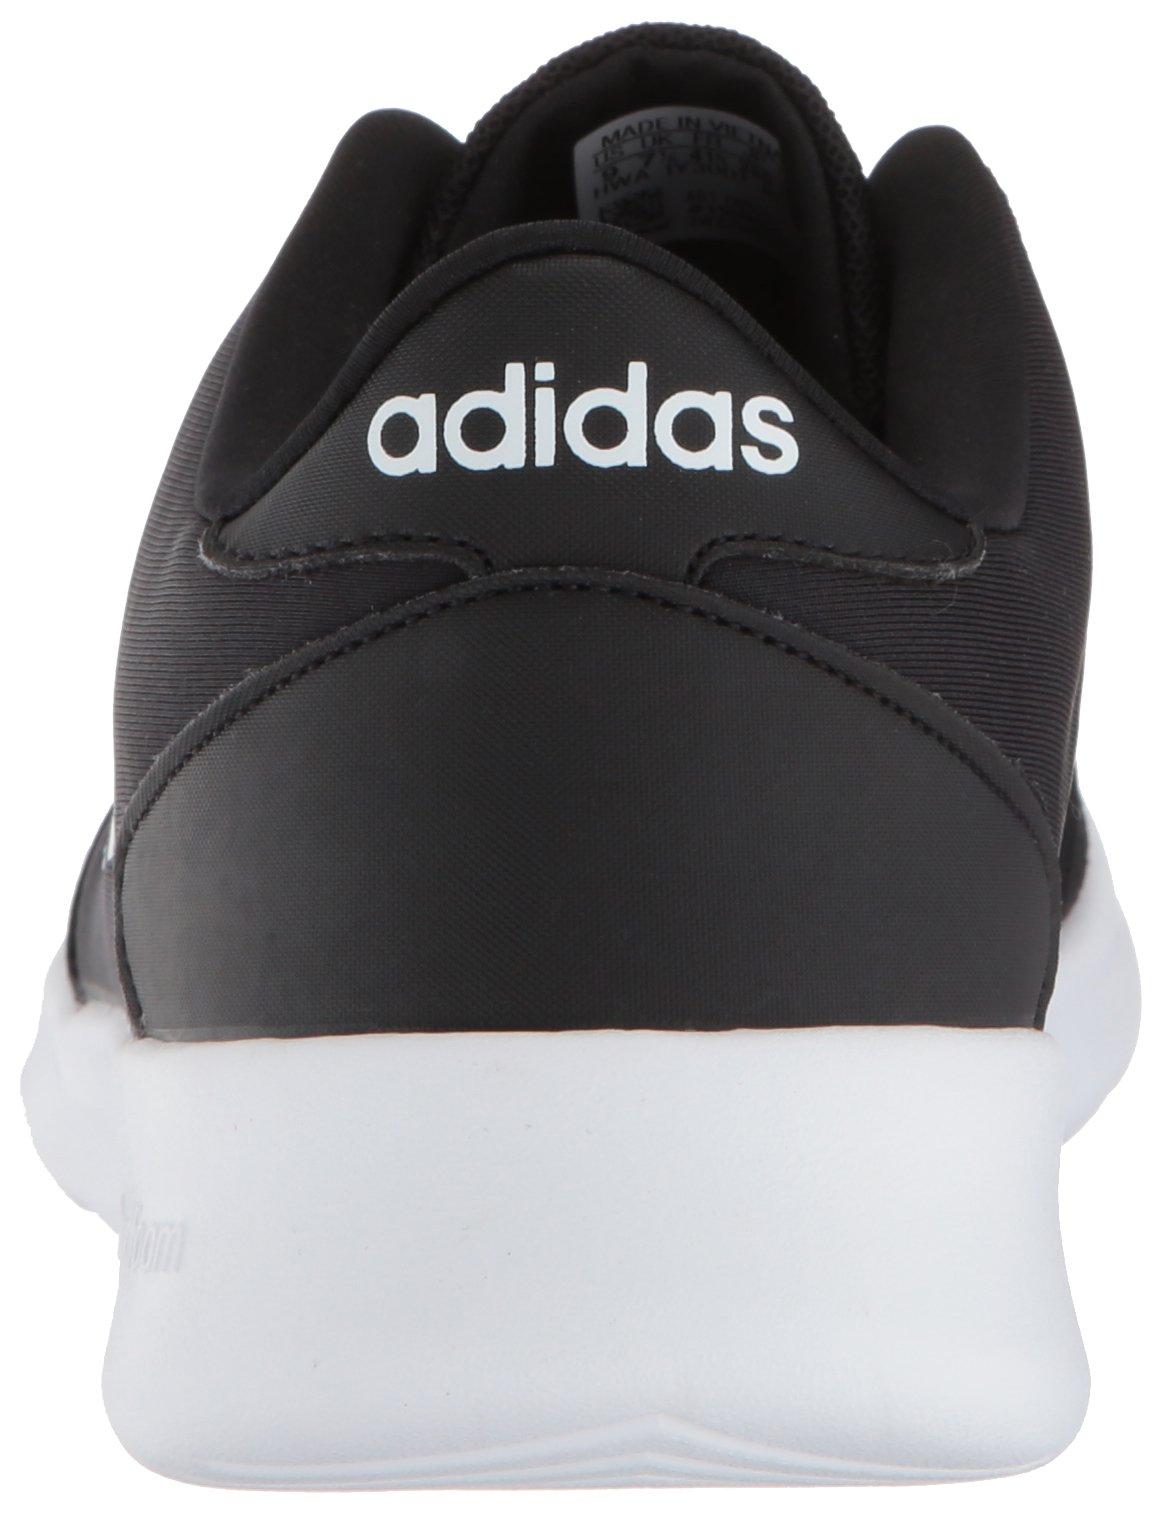 adidas Women's Cloudfoam QT Racer Running Shoe, Black/White/Carbon, 5 M US by adidas (Image #2)